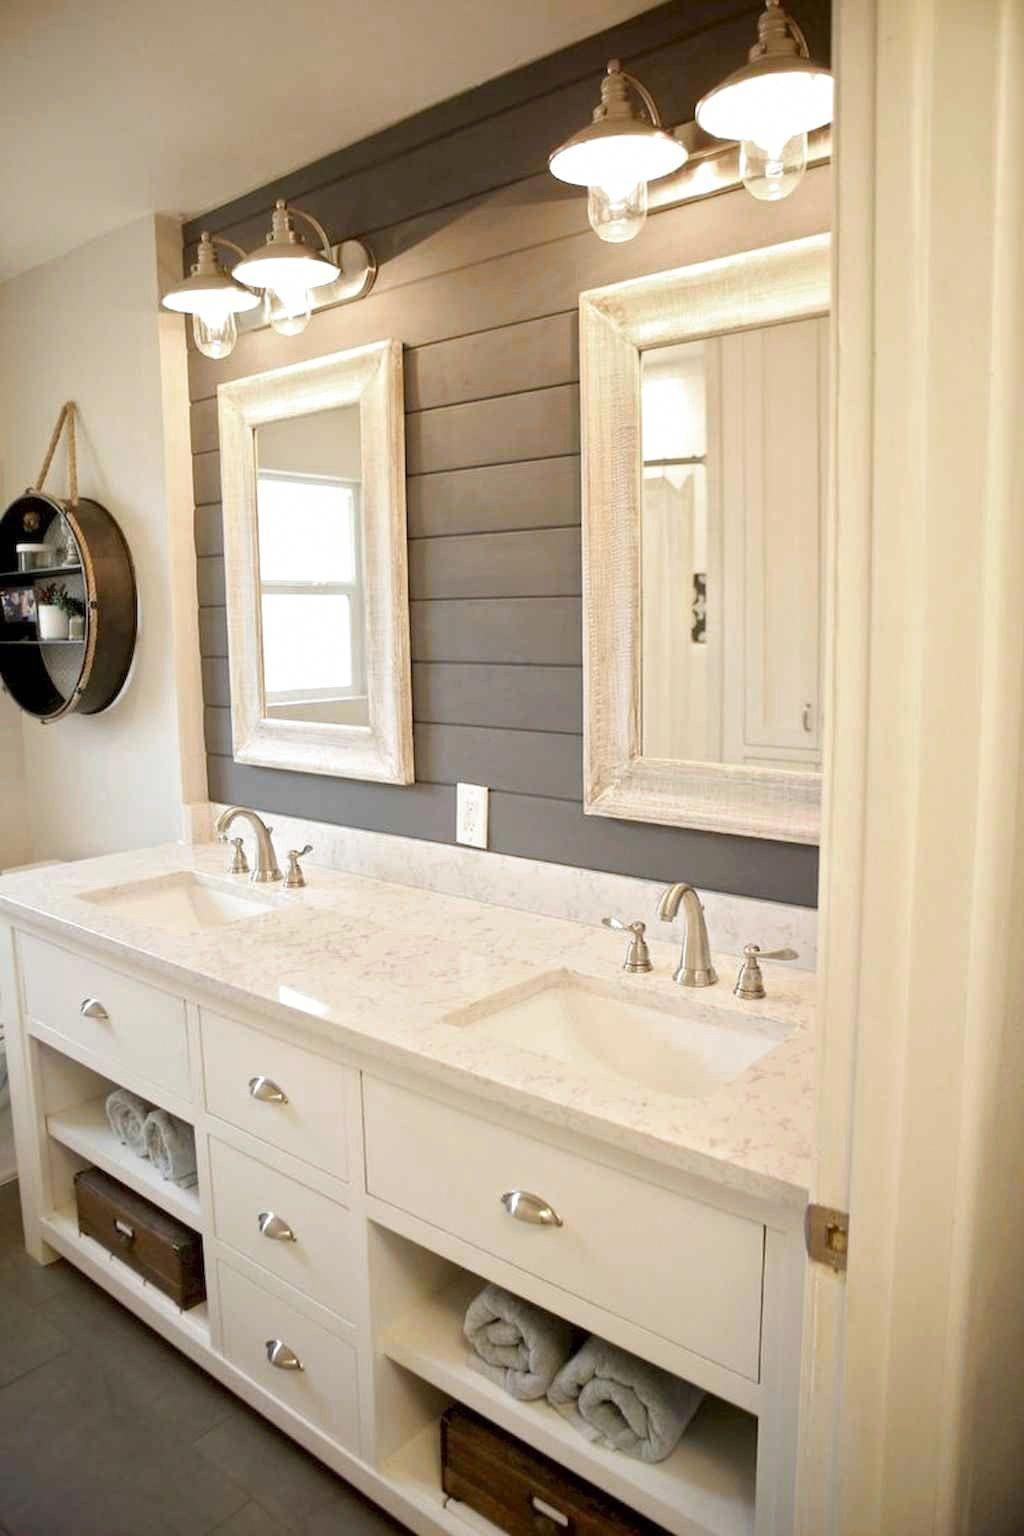 80 Favourite Farmhouse Bathroom Decor Ideas Favouritefarmhousebathroomdecorideas In 2020 Bathroom Remodel Master Bathrooms Remodel Farmhouse Bathroom Decor